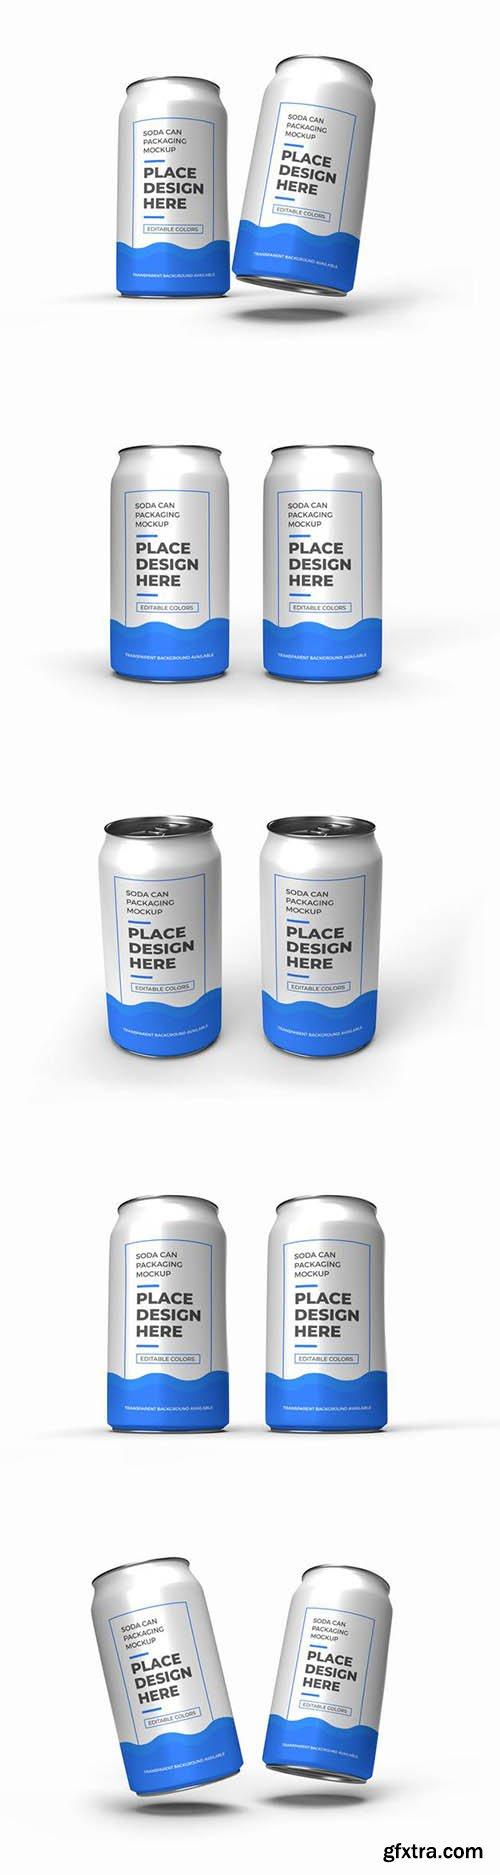 Soda can packaging mockup 2